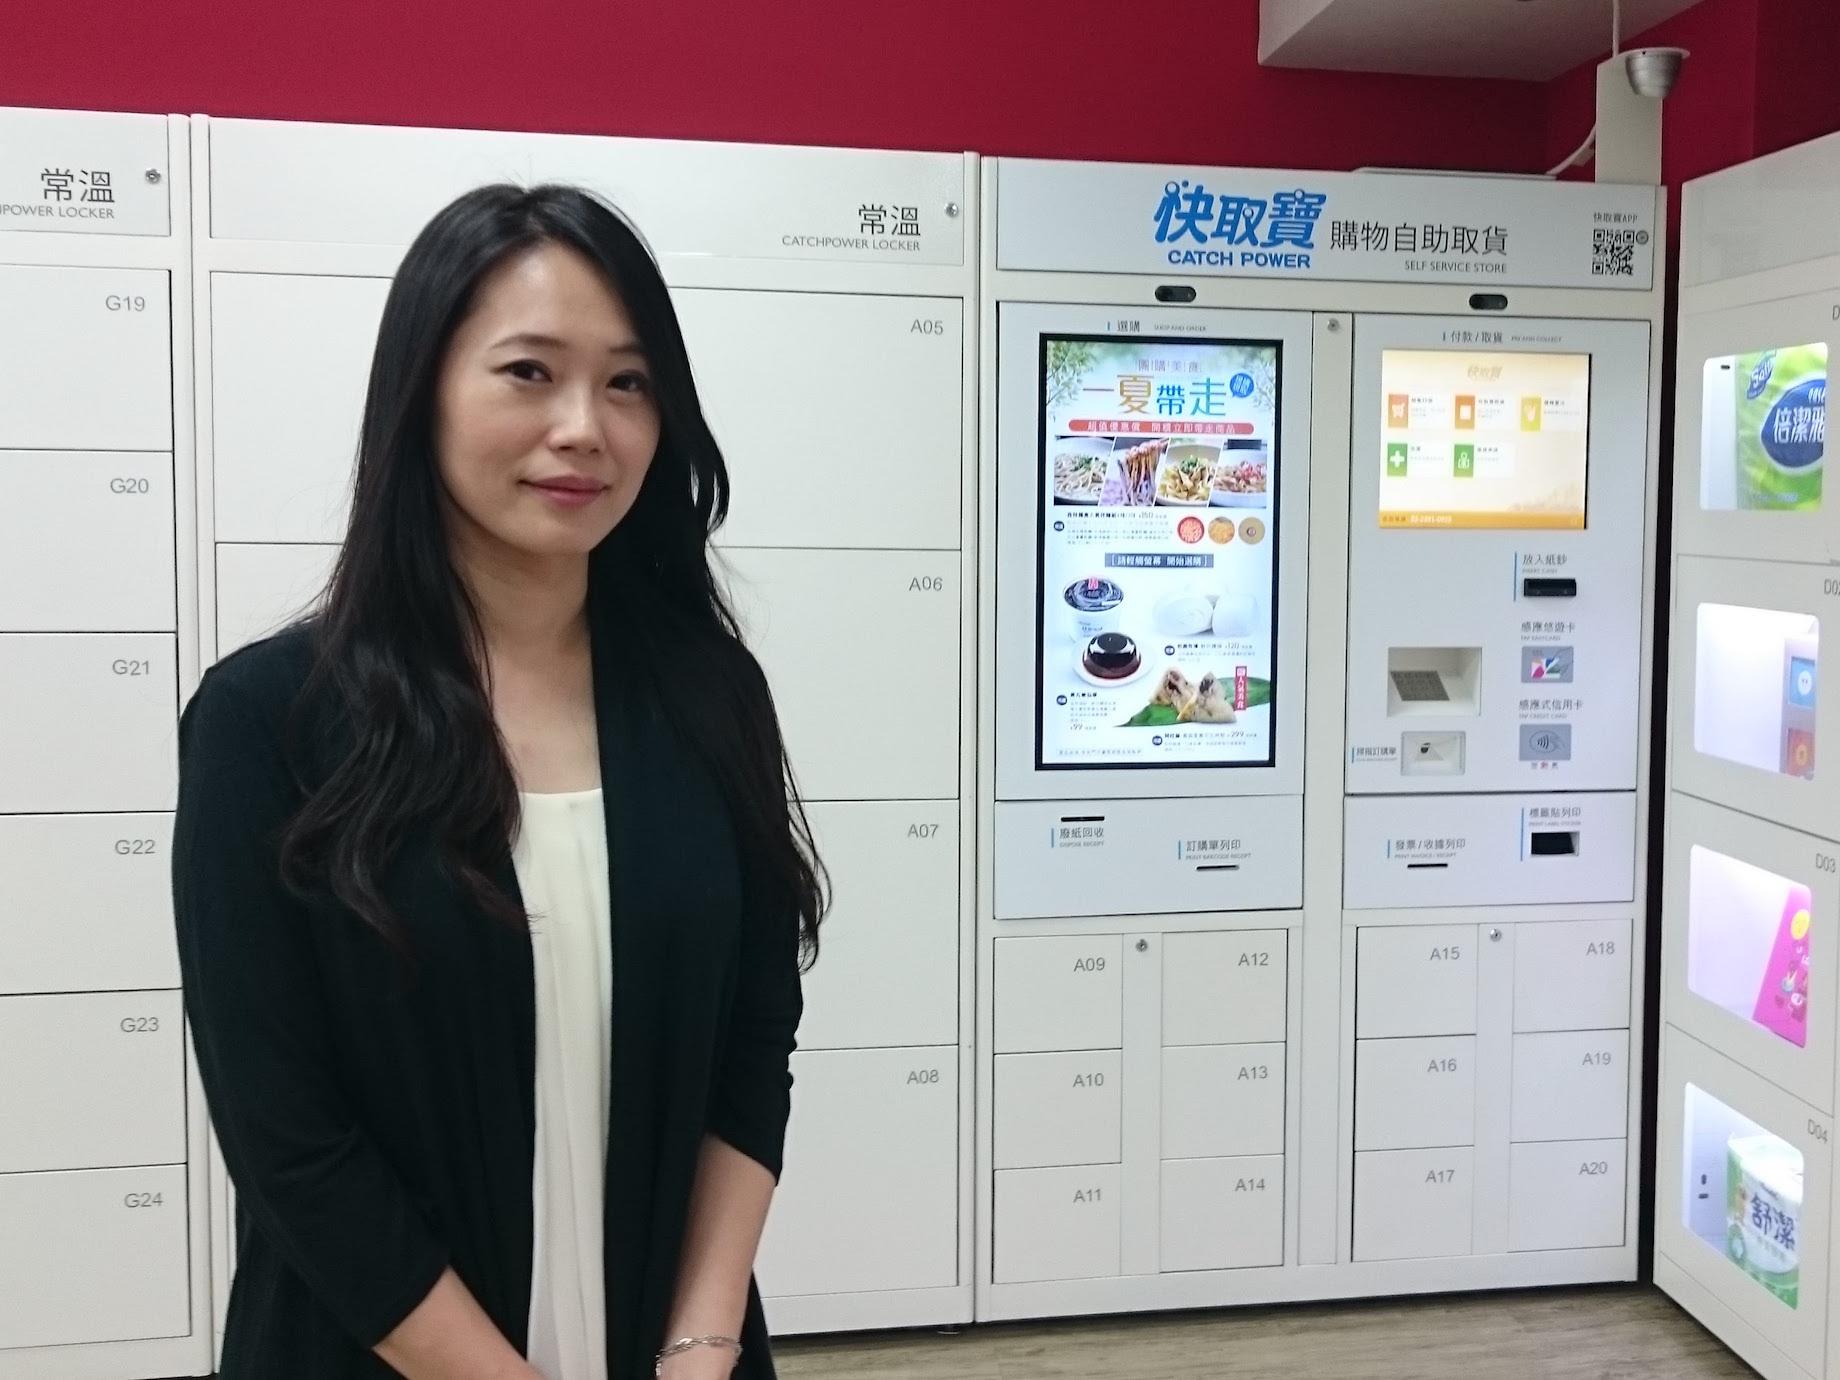 SmartM電子商務學院》快取寶創造無接縫消費者體驗!有效整合O2O的3項祕訣